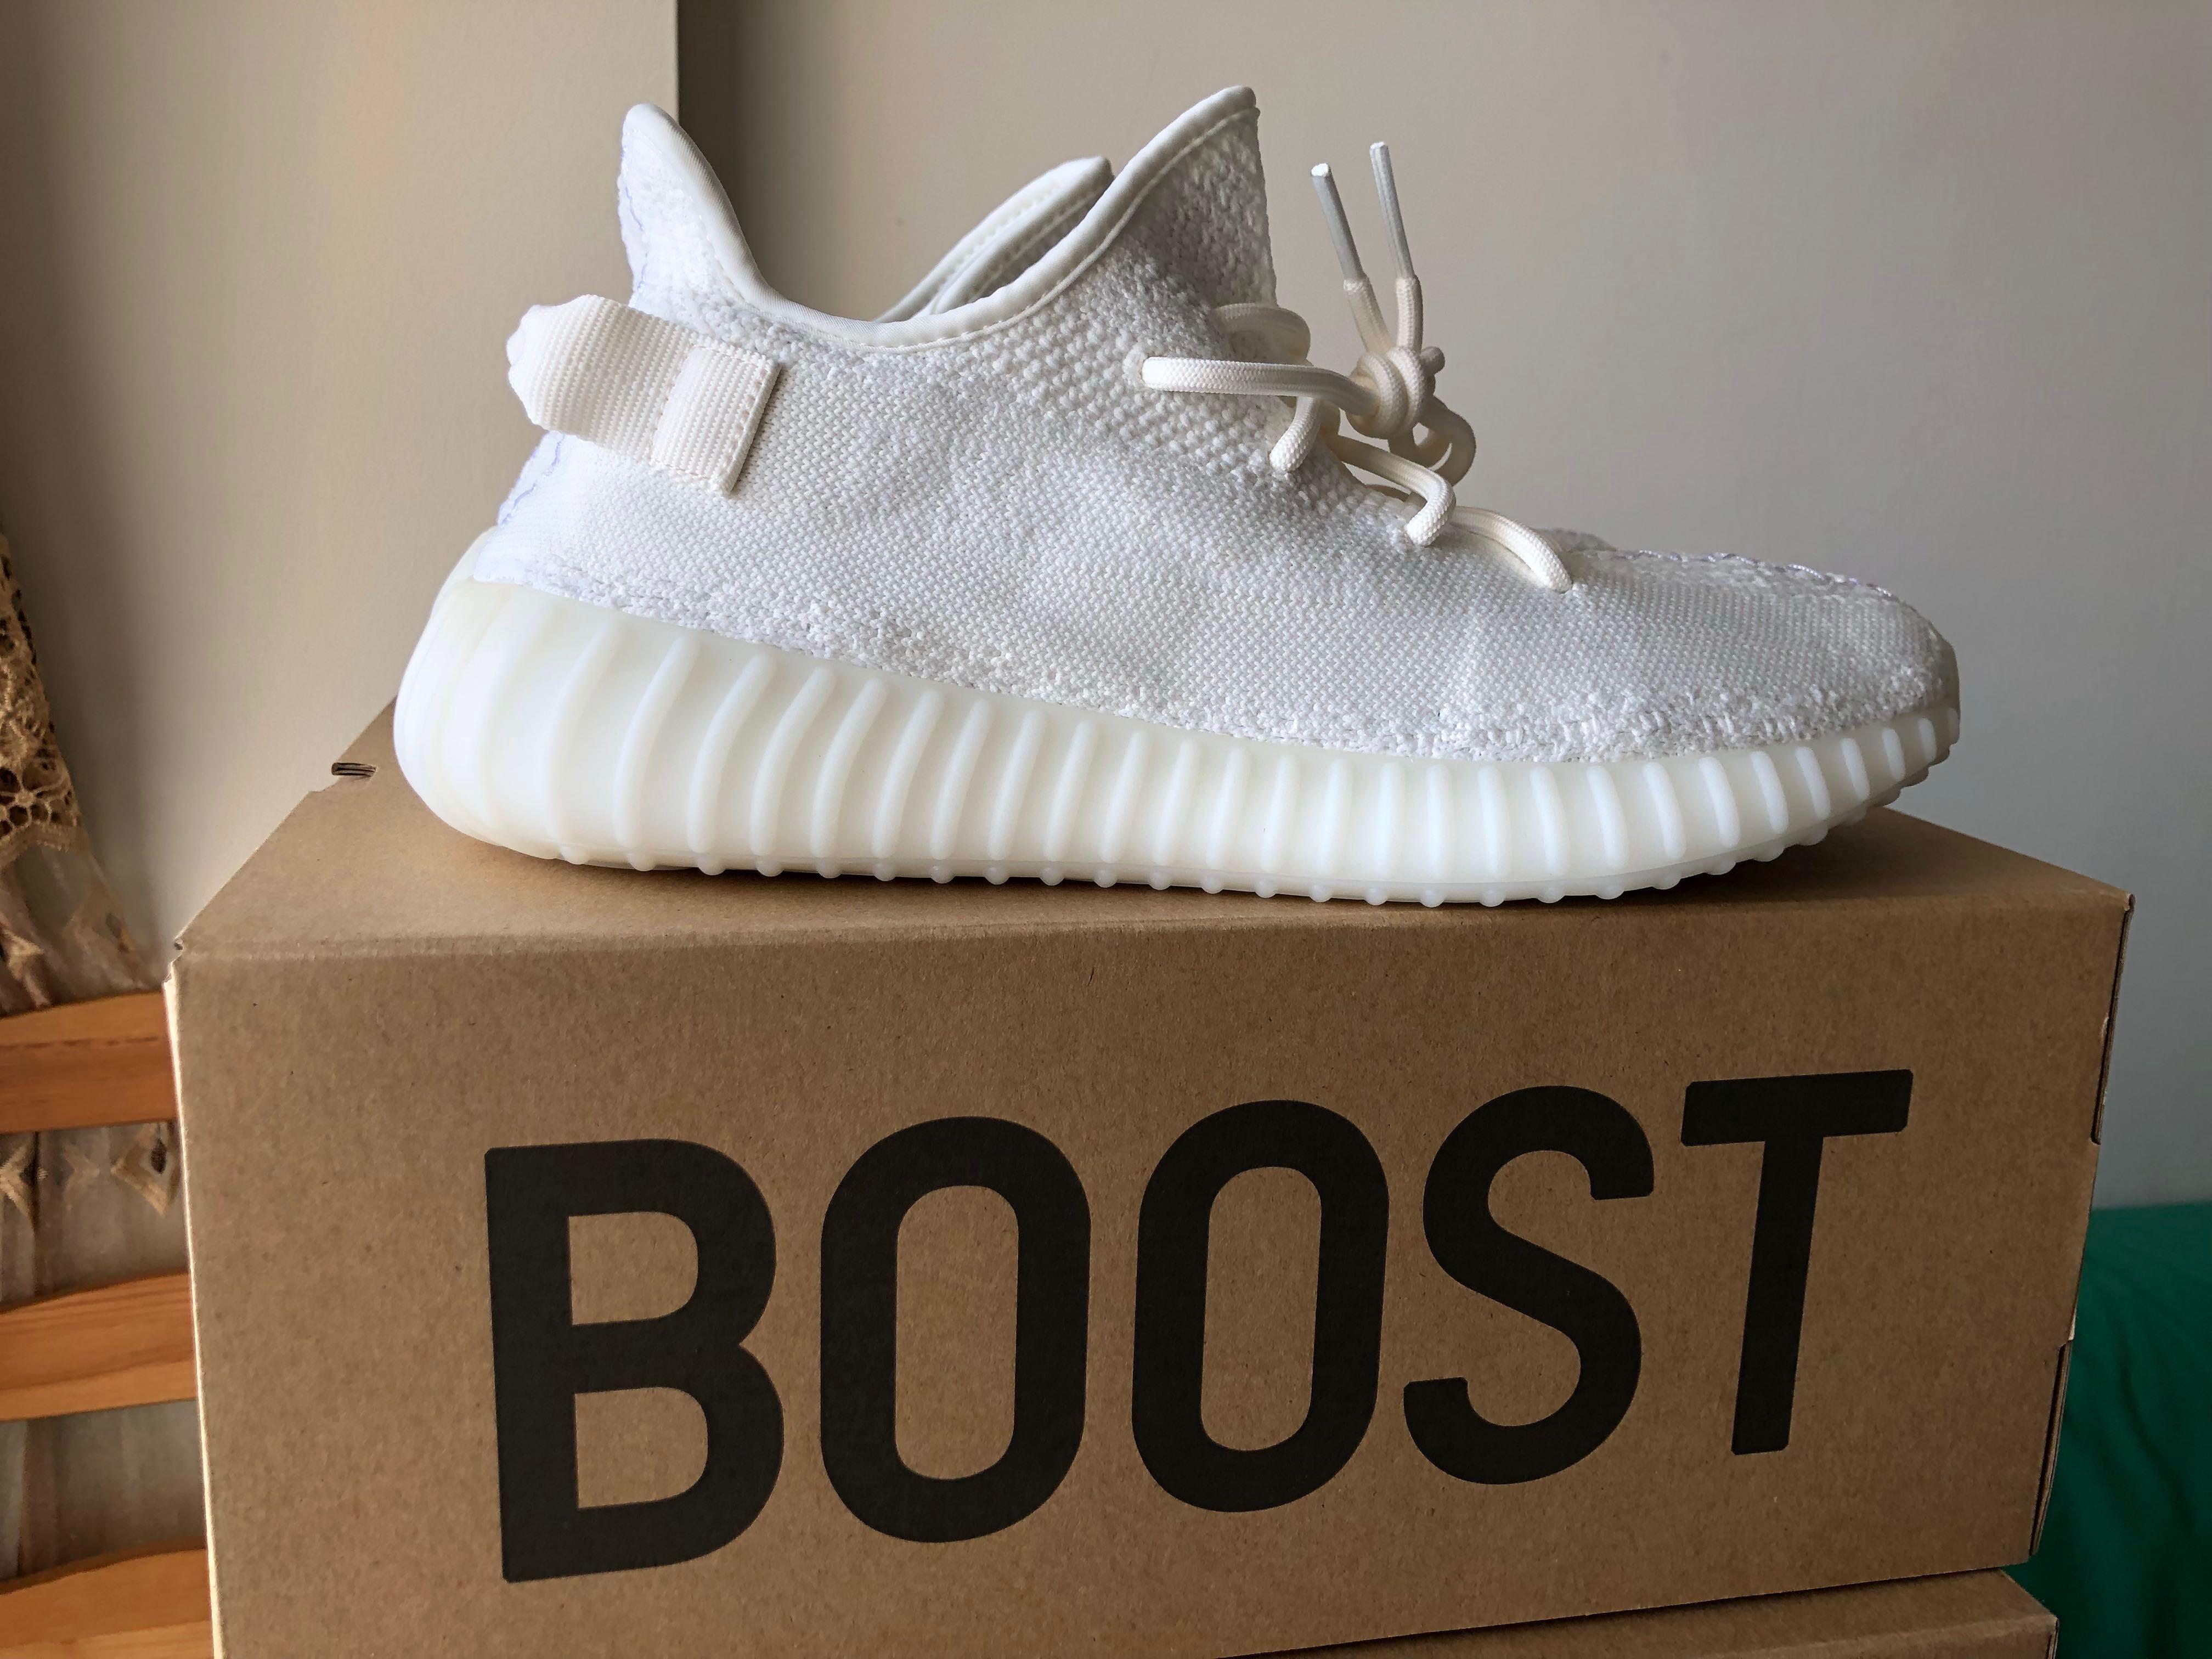 d9ff5be5 Yeezy Boost 350 V2 Cream White US11/UK10.5, Men's Fashion, Footwear ...